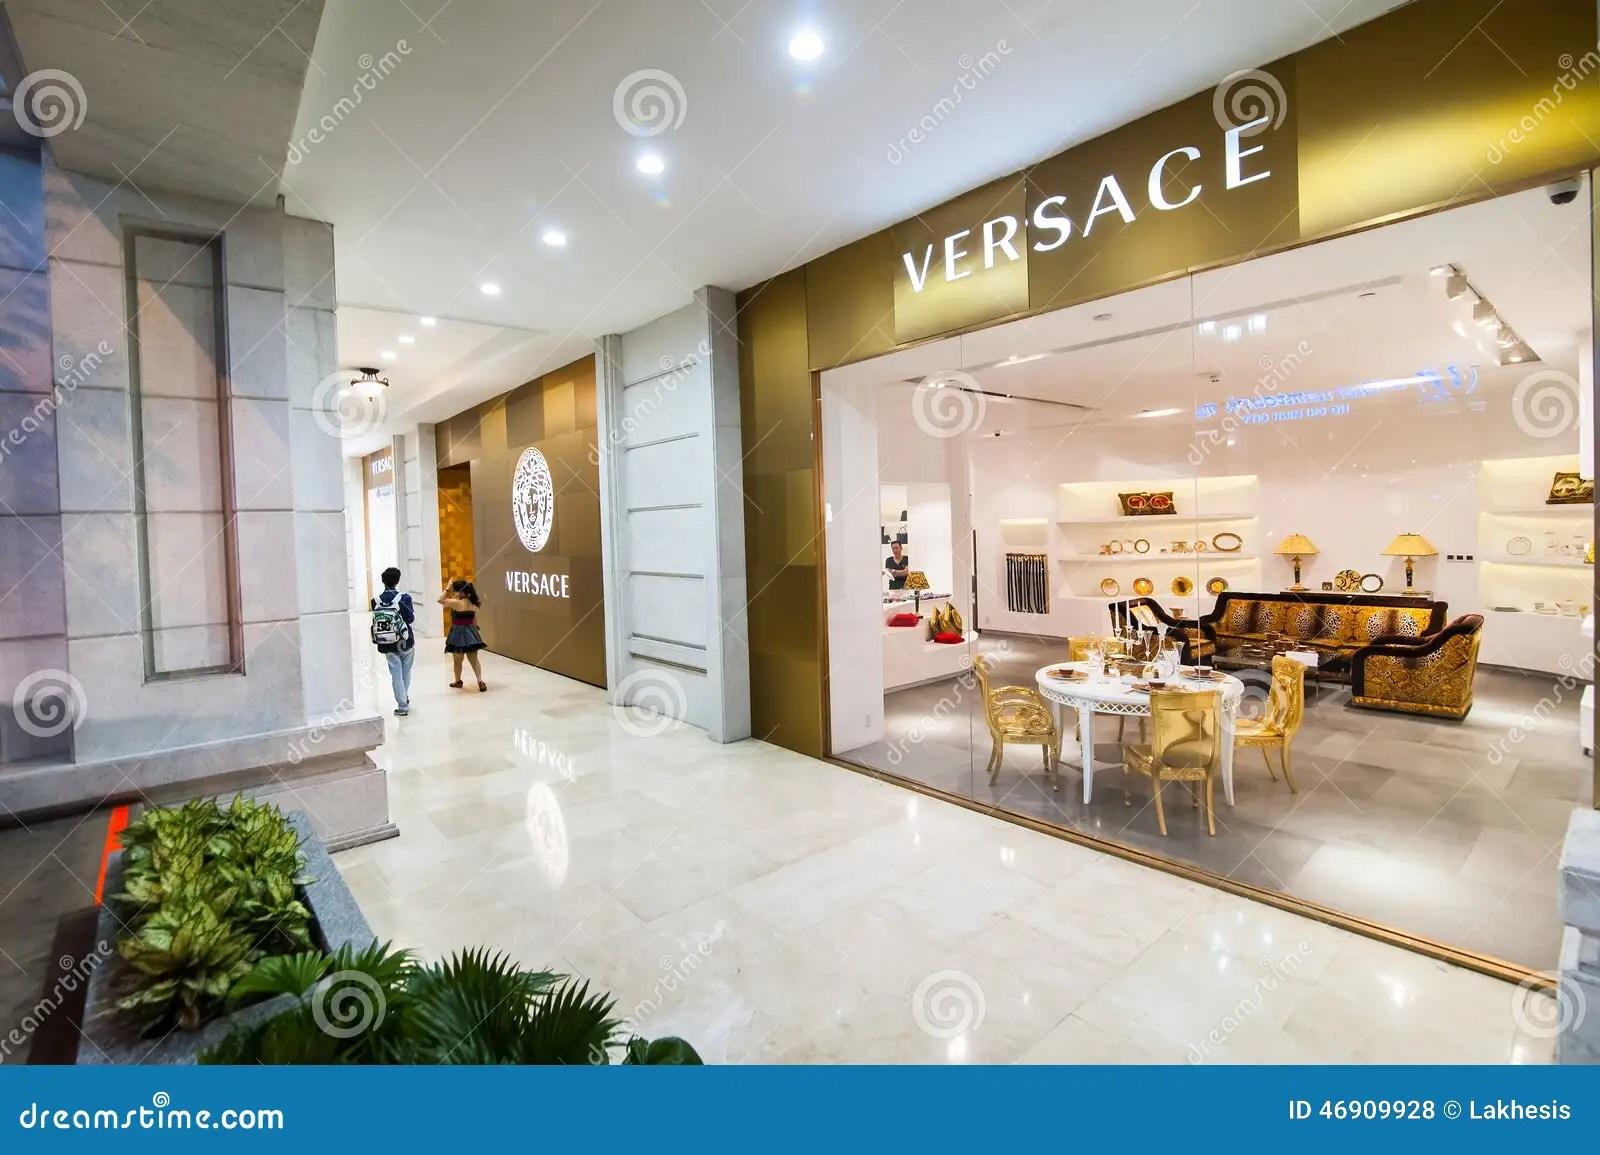 Versace Boutique Display Window Ho Chi Minh Vietnam